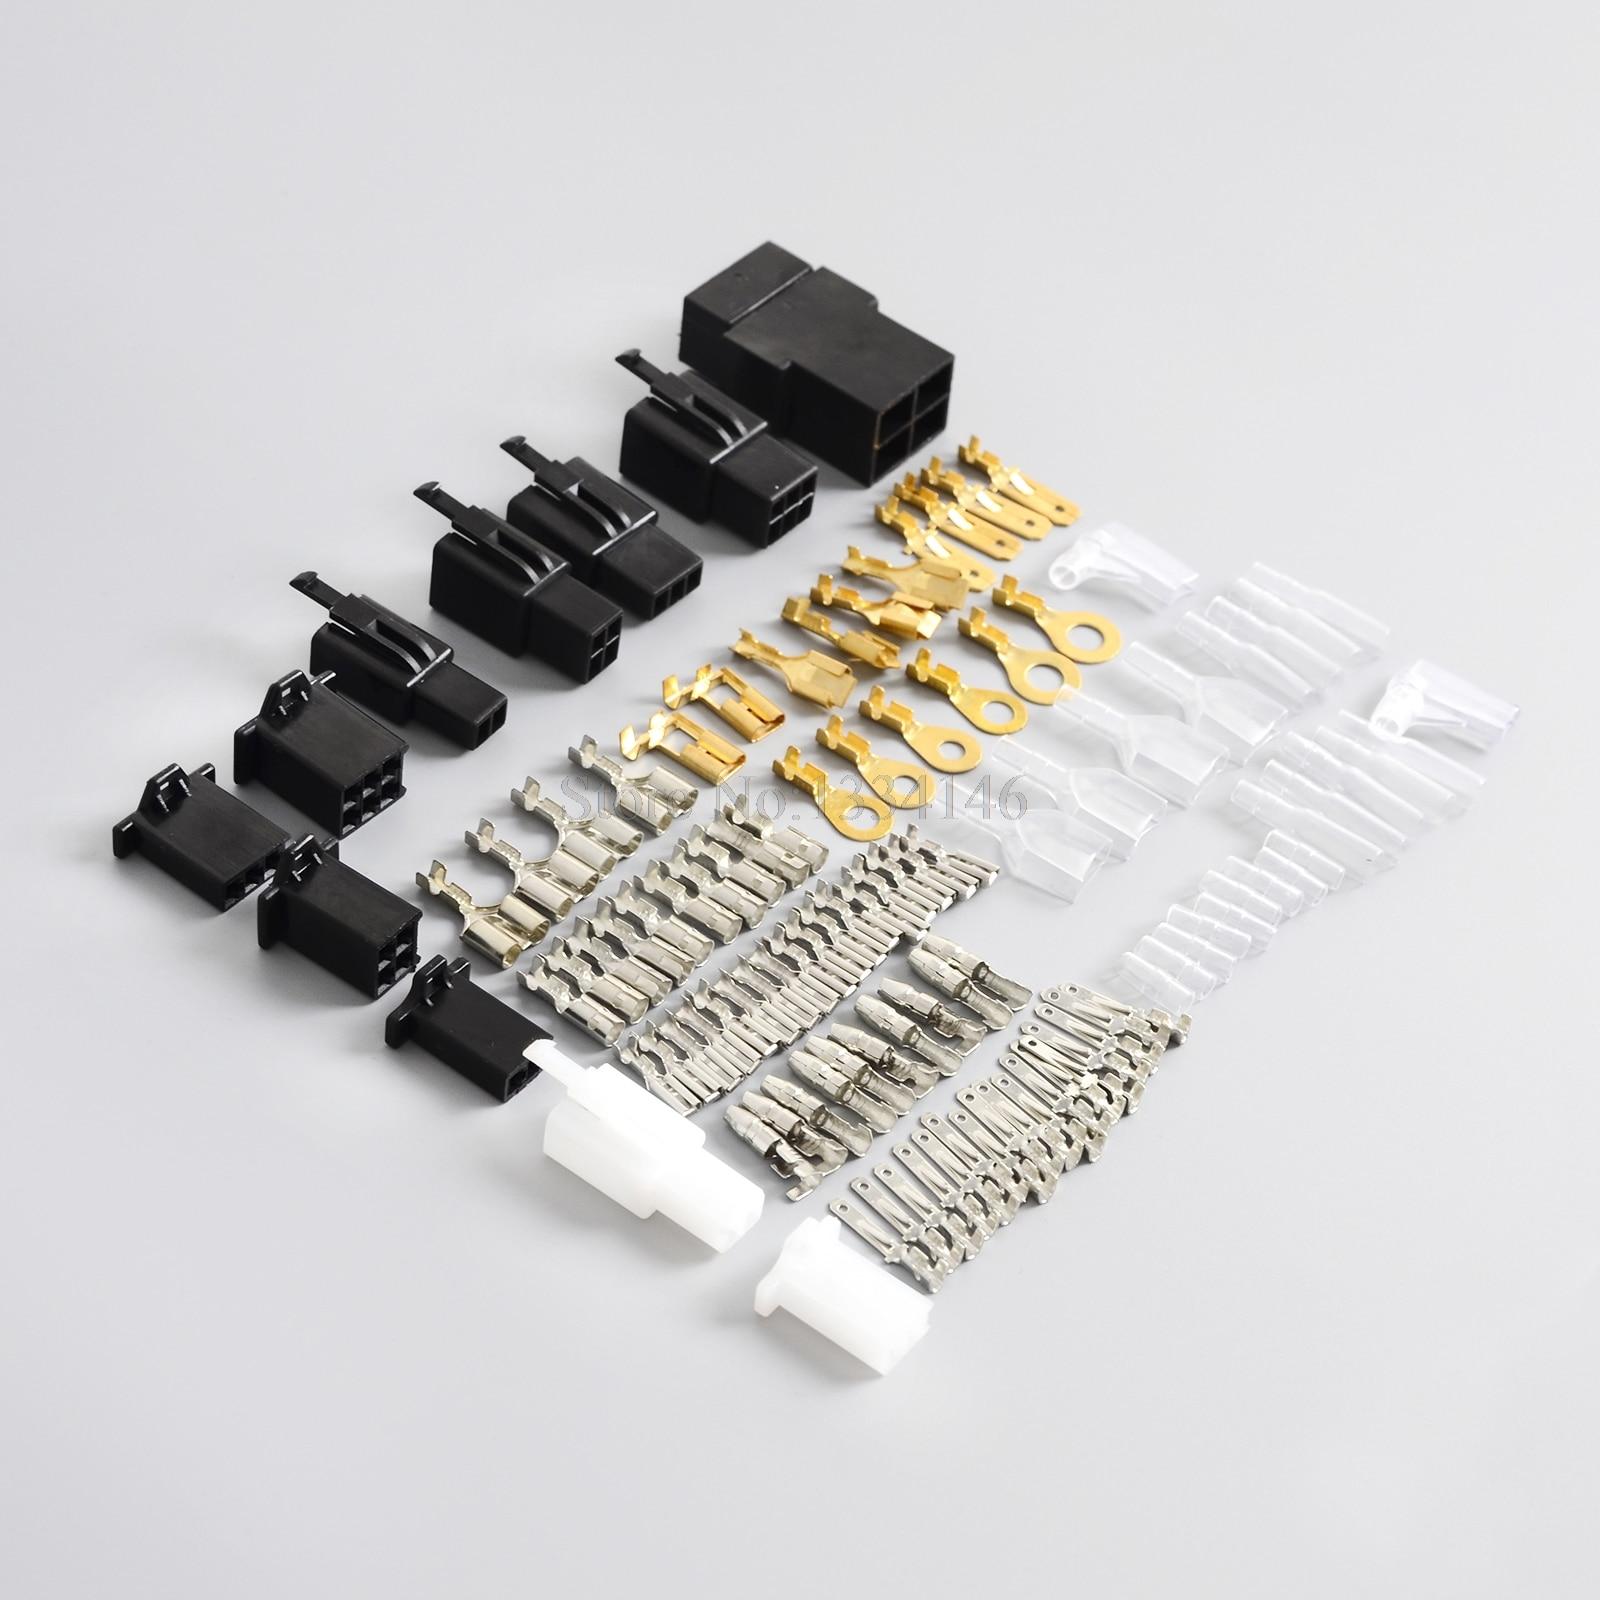 hight resolution of universal motorcycle wiring harness loom repair kit plugs bullet connectors for honda yamaha suzuki kawasaki